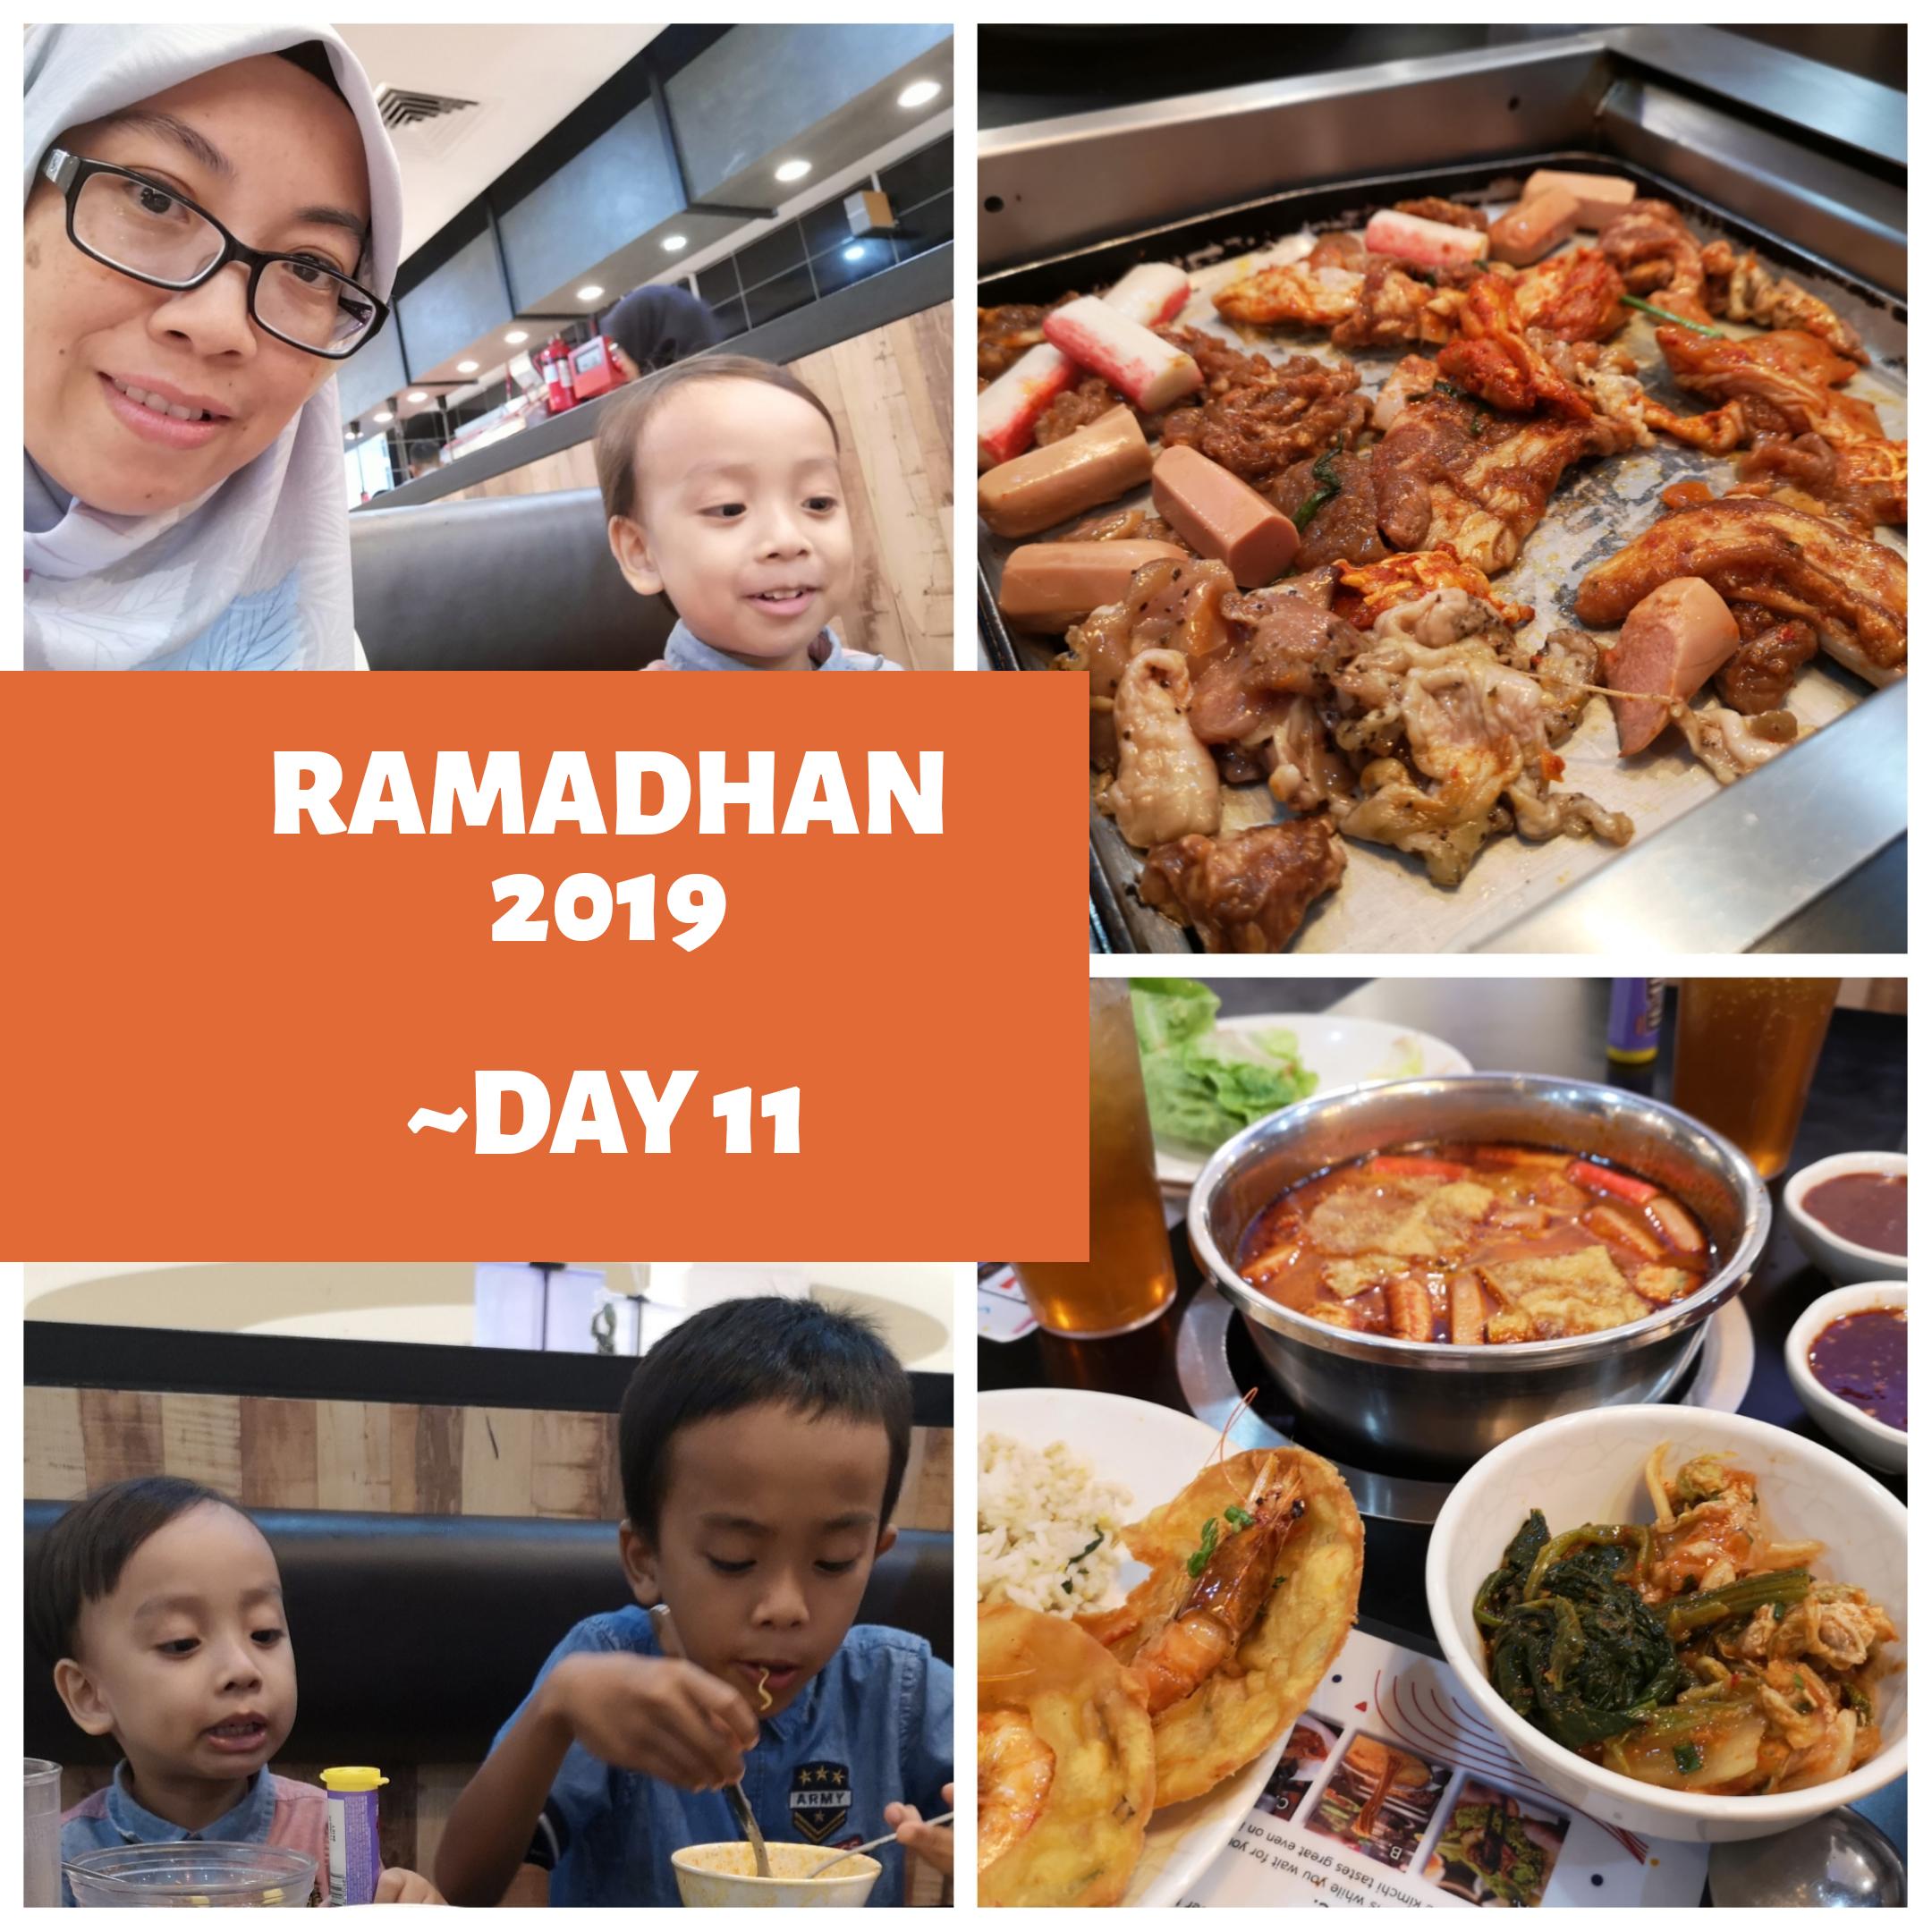 Ramadhan 2019 – Day 11